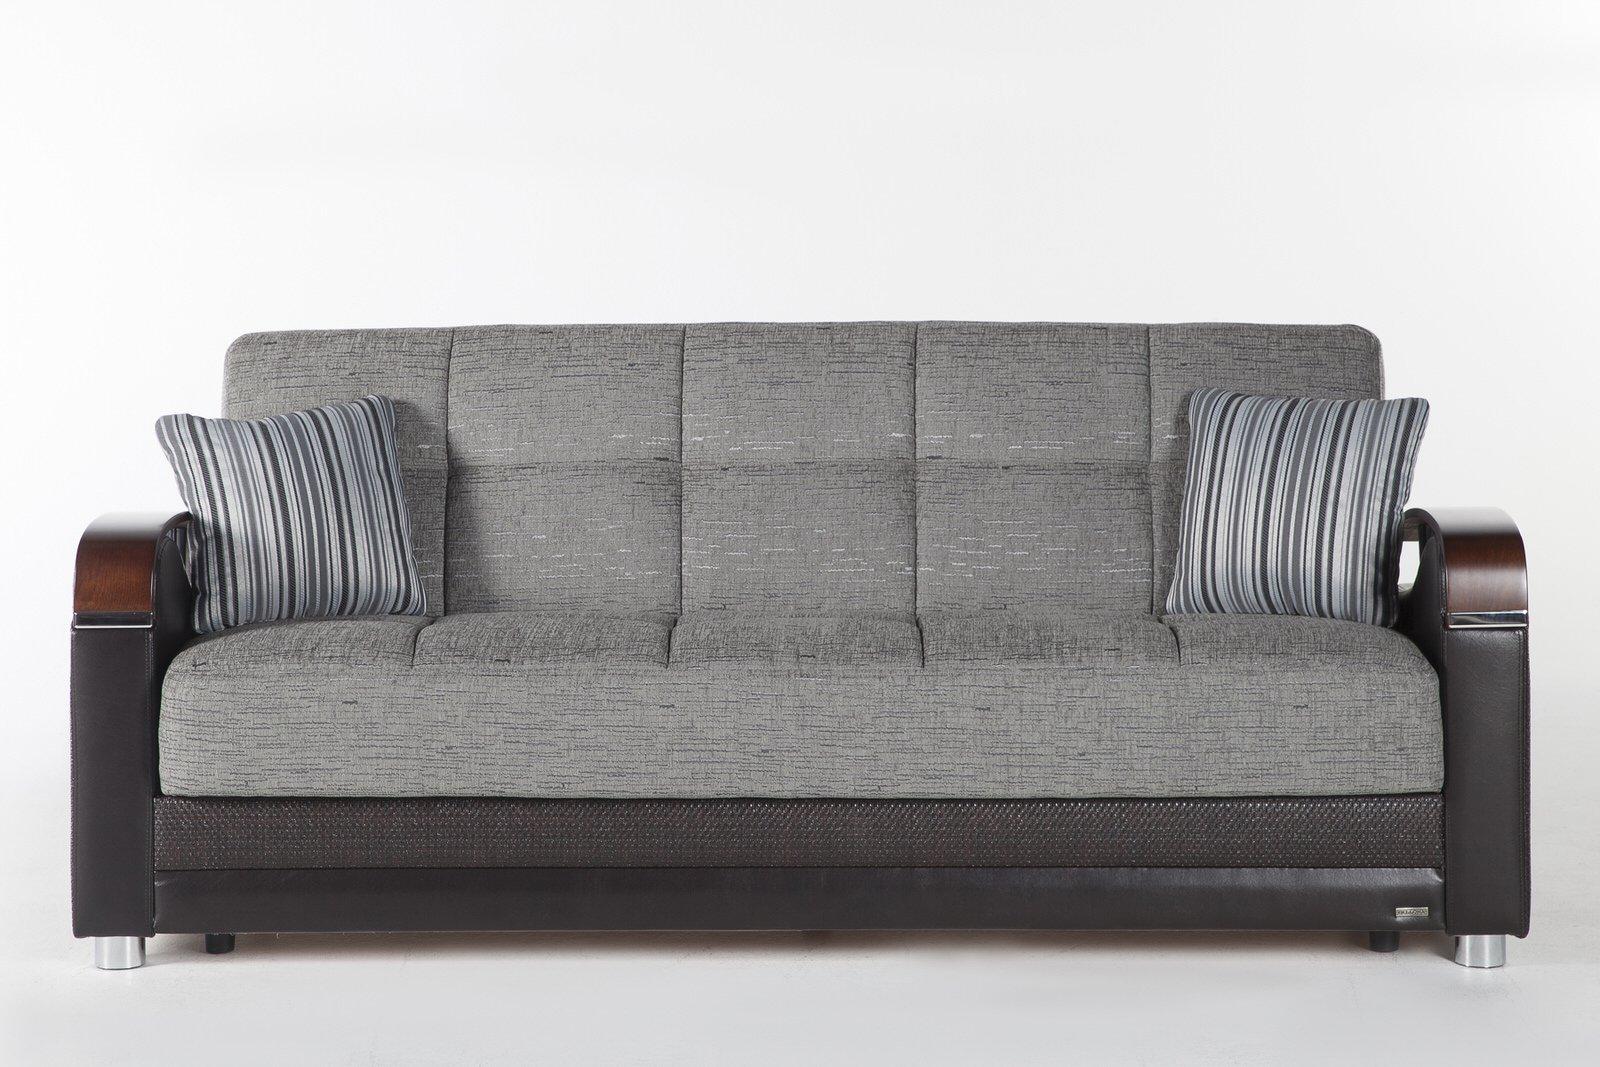 Luna Fulya Gray Convertible Sofa Bed With Storage Marjen